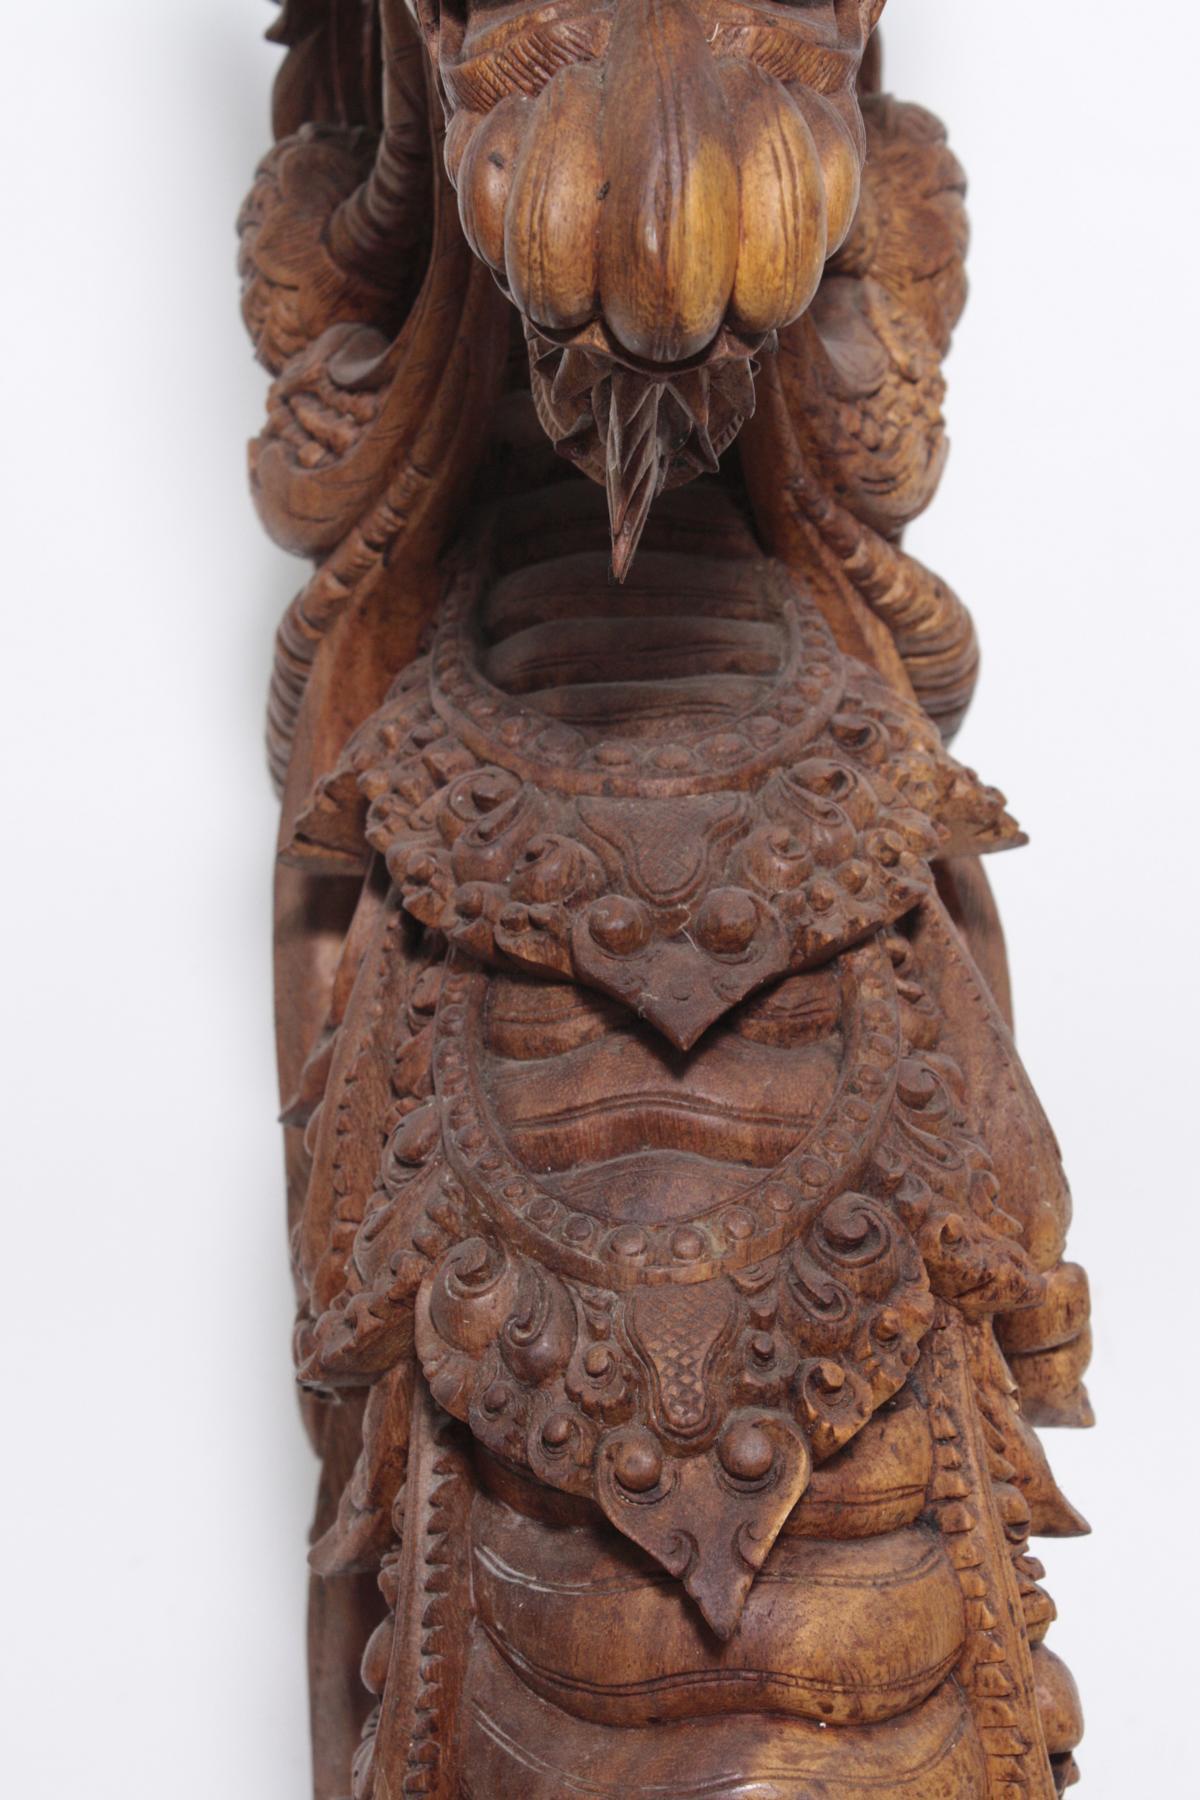 Große Holzskulptur, Drache, Indonesien, 2. Hälfte 20. Jahrhundert-4